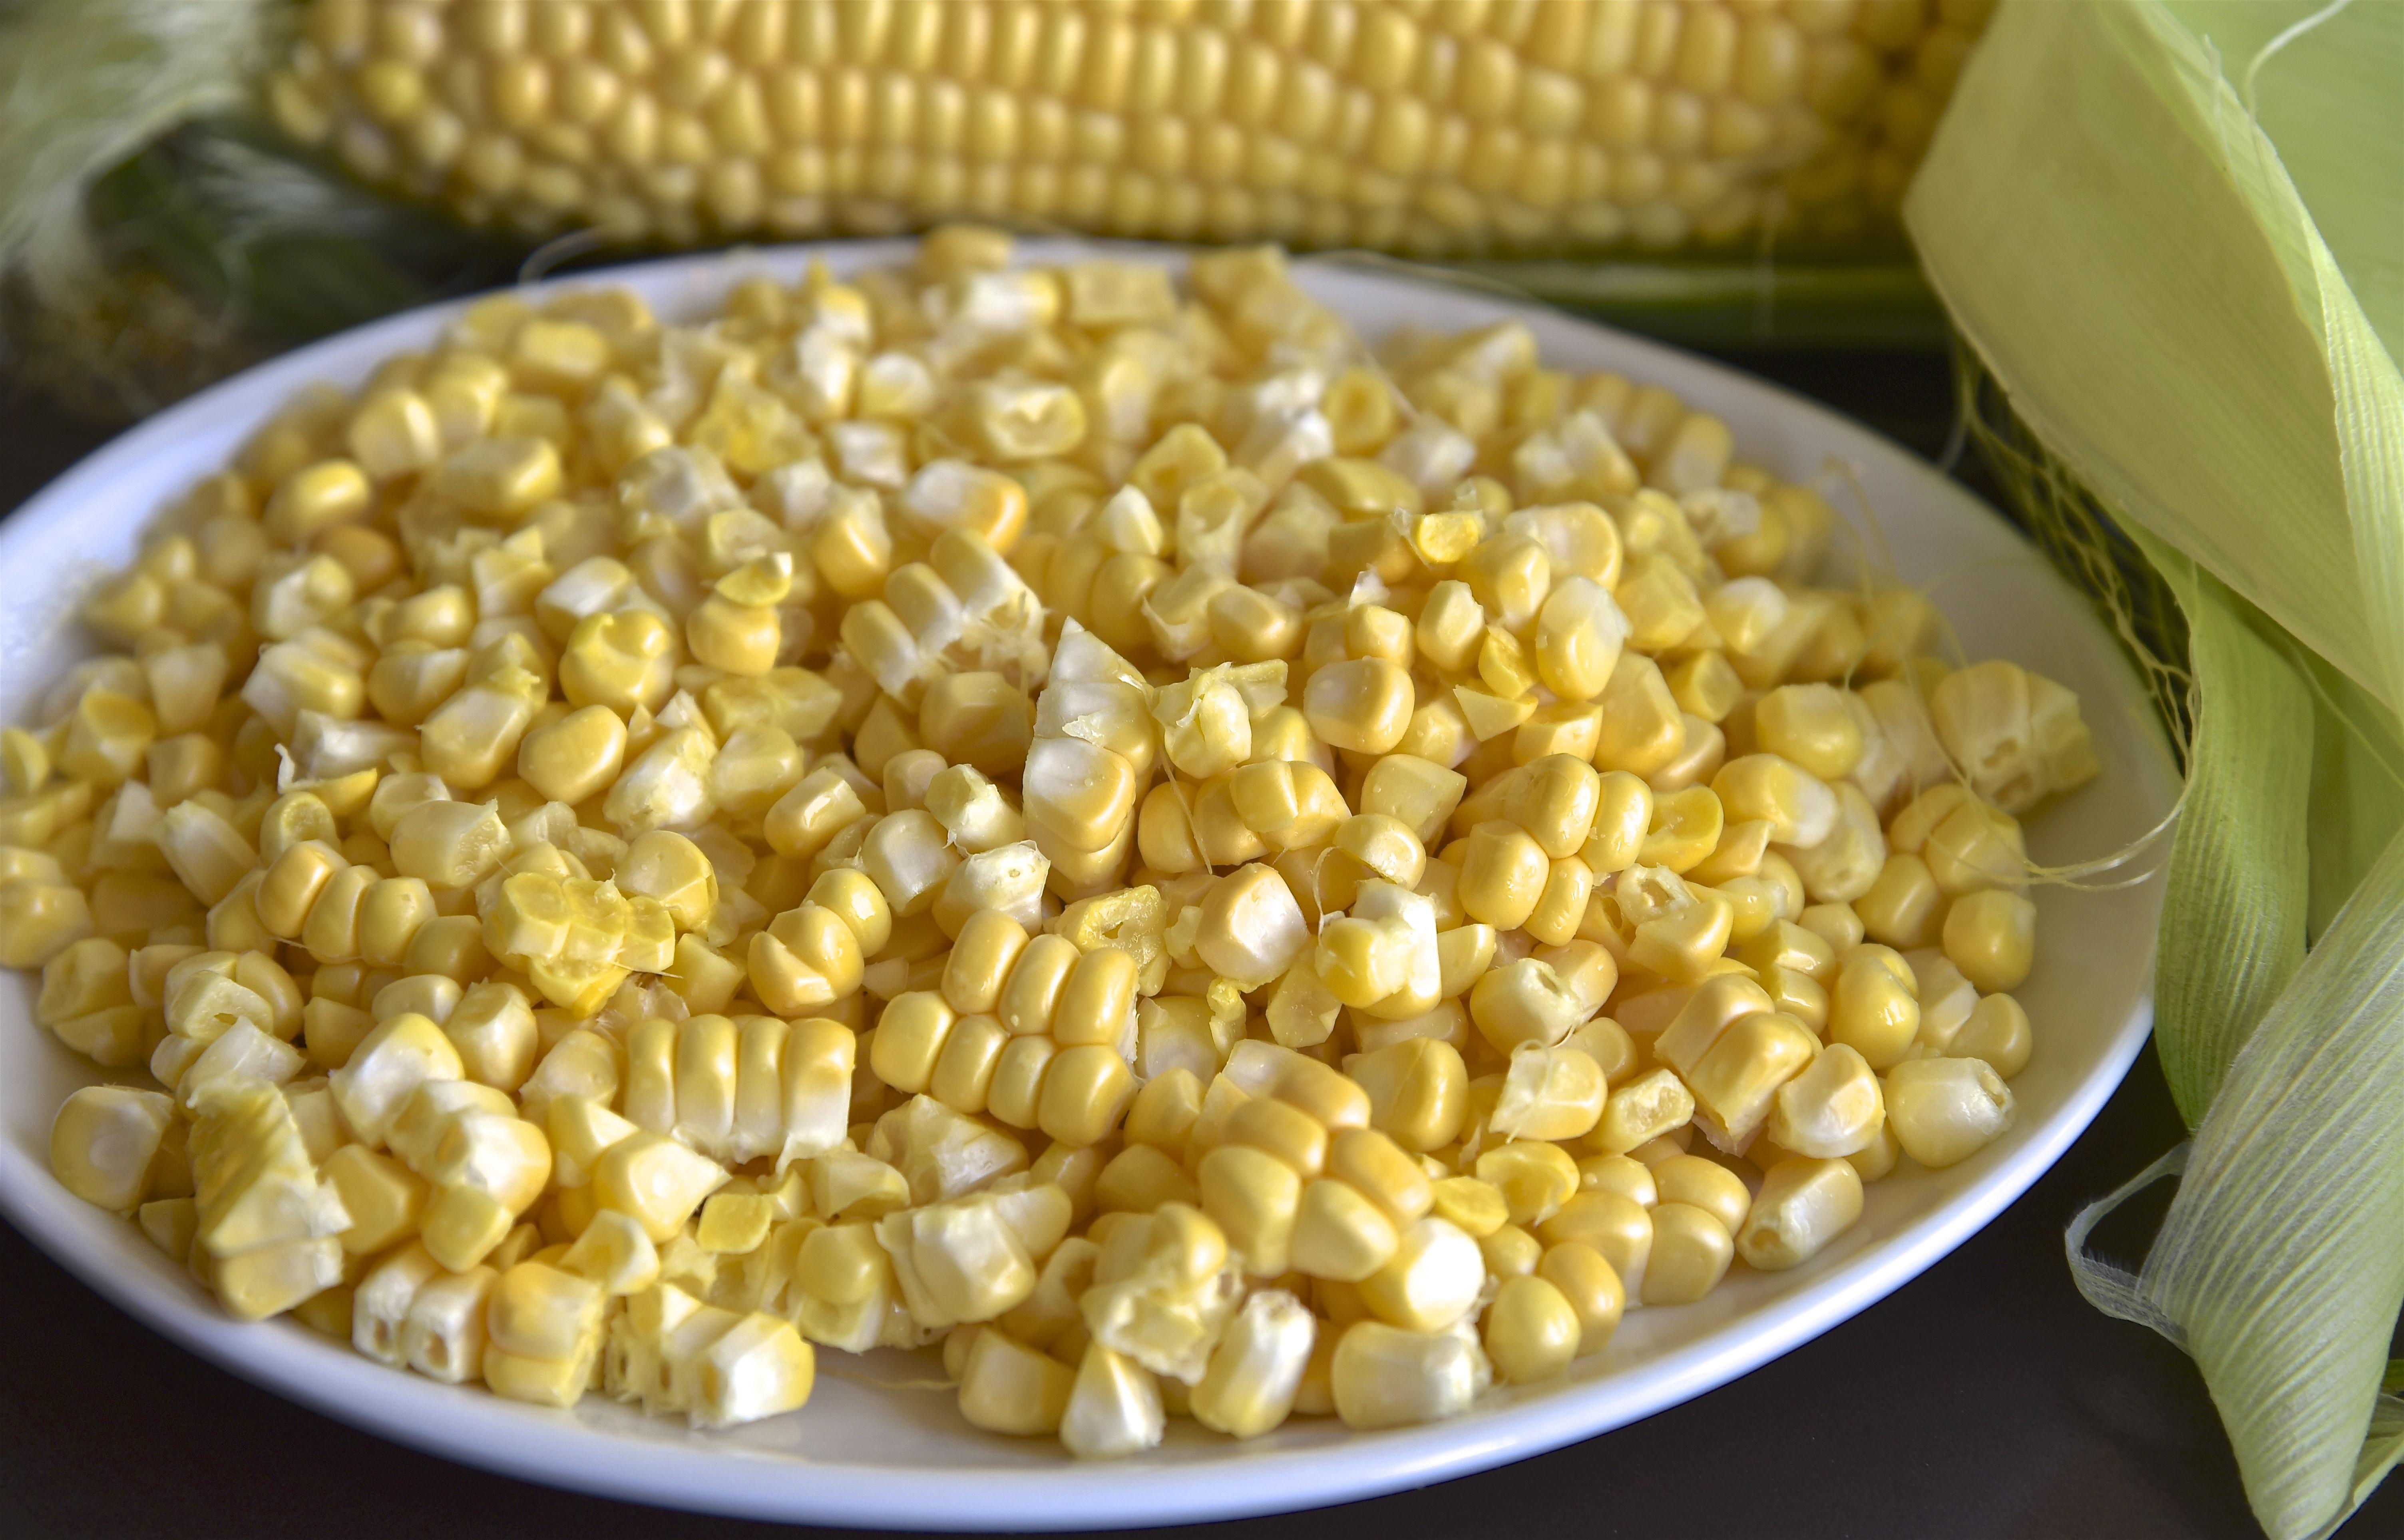 Shucked Corn Kernels